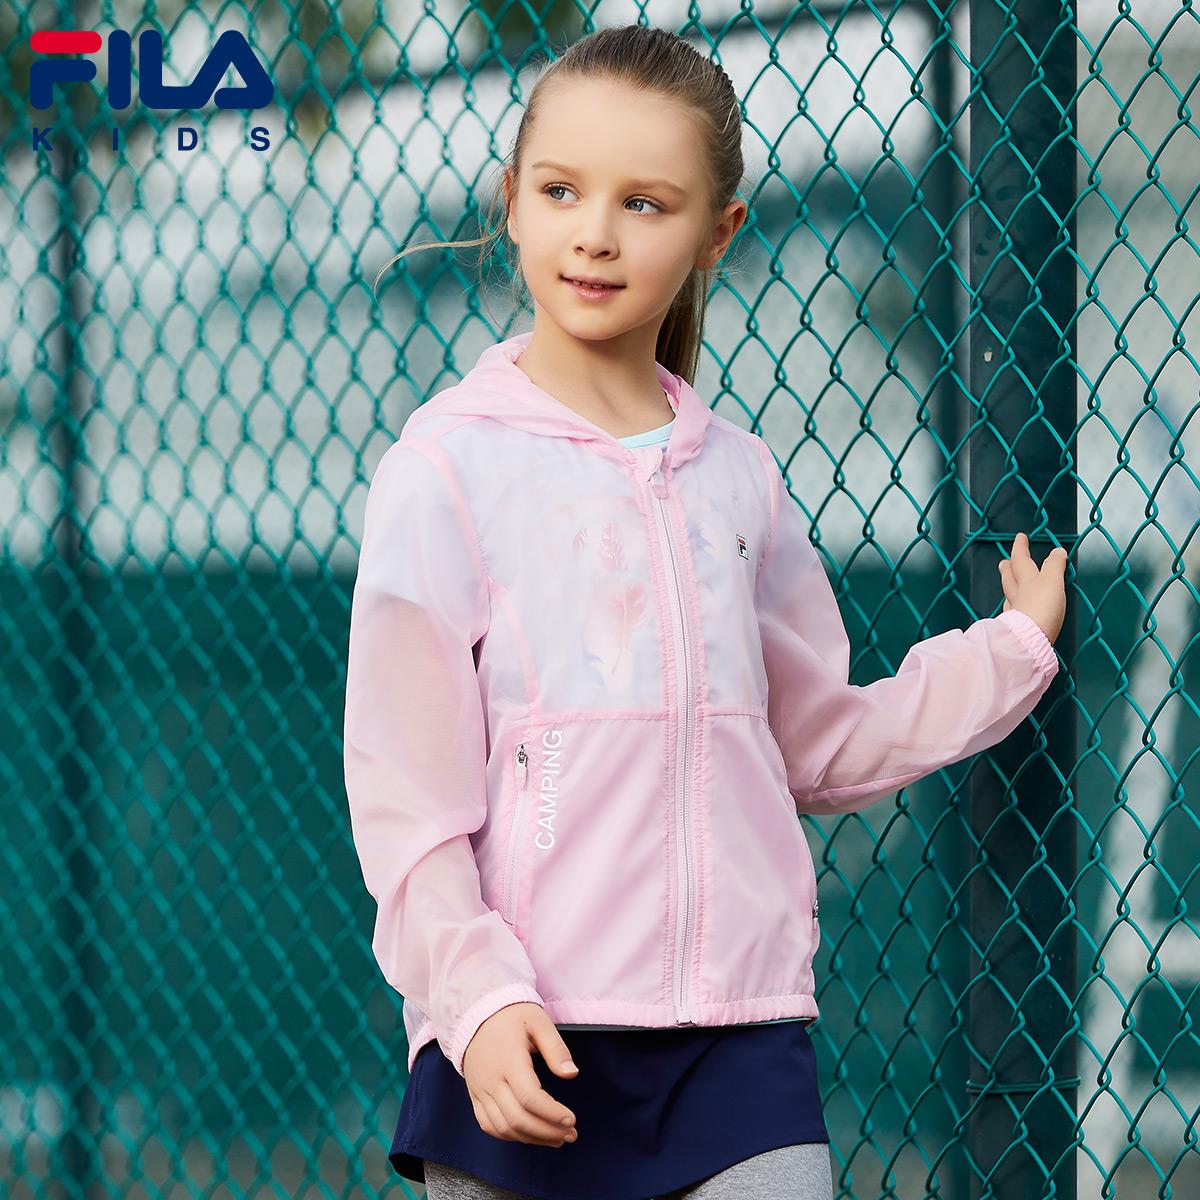 FILA斐乐童装夏季新款女童梭织夹克运动防紫外线连帽运动外套2018